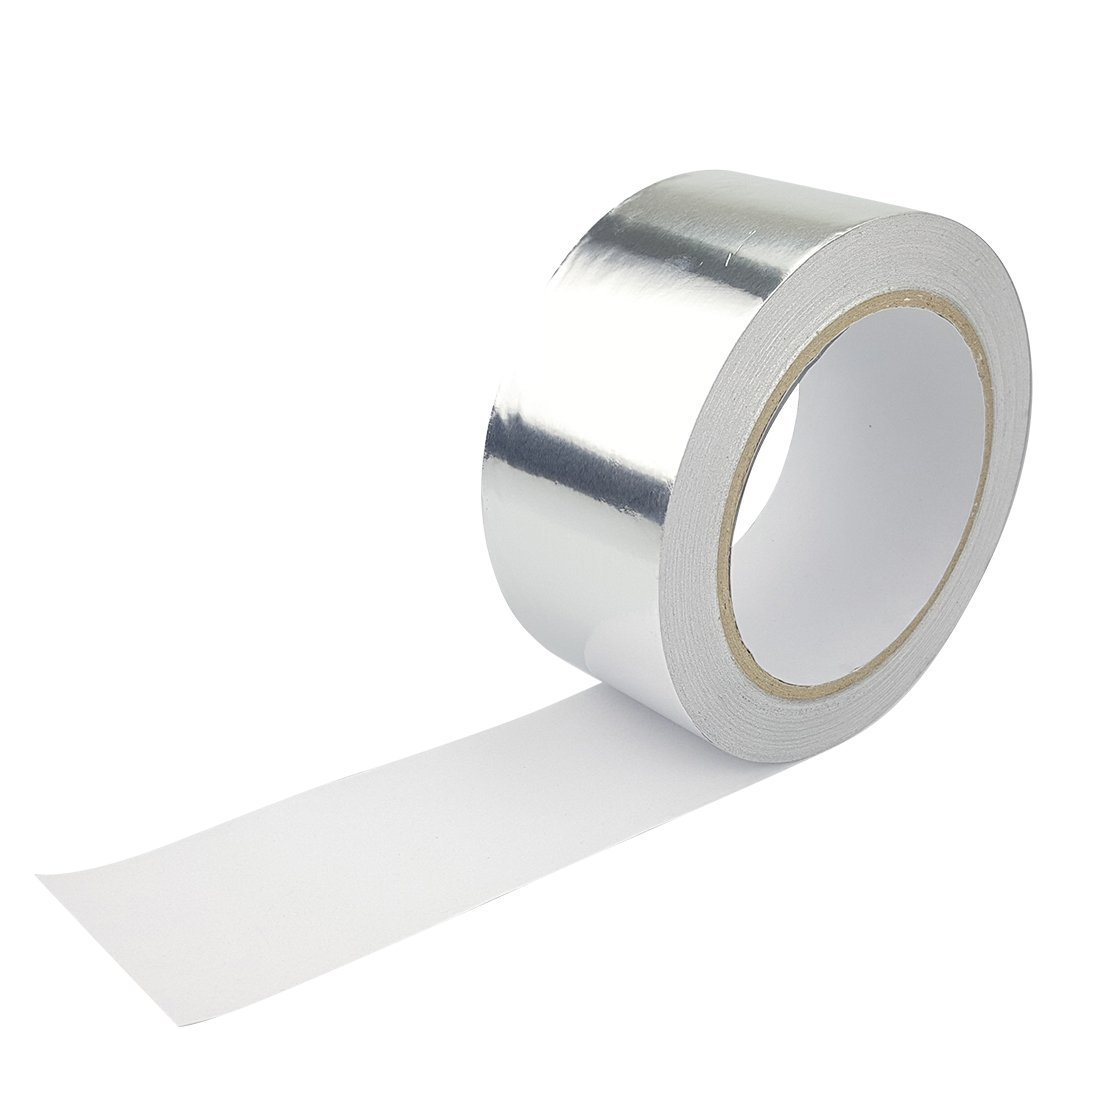 TIFANTI Aluminium Foil Tape, 50 mm x 25 m